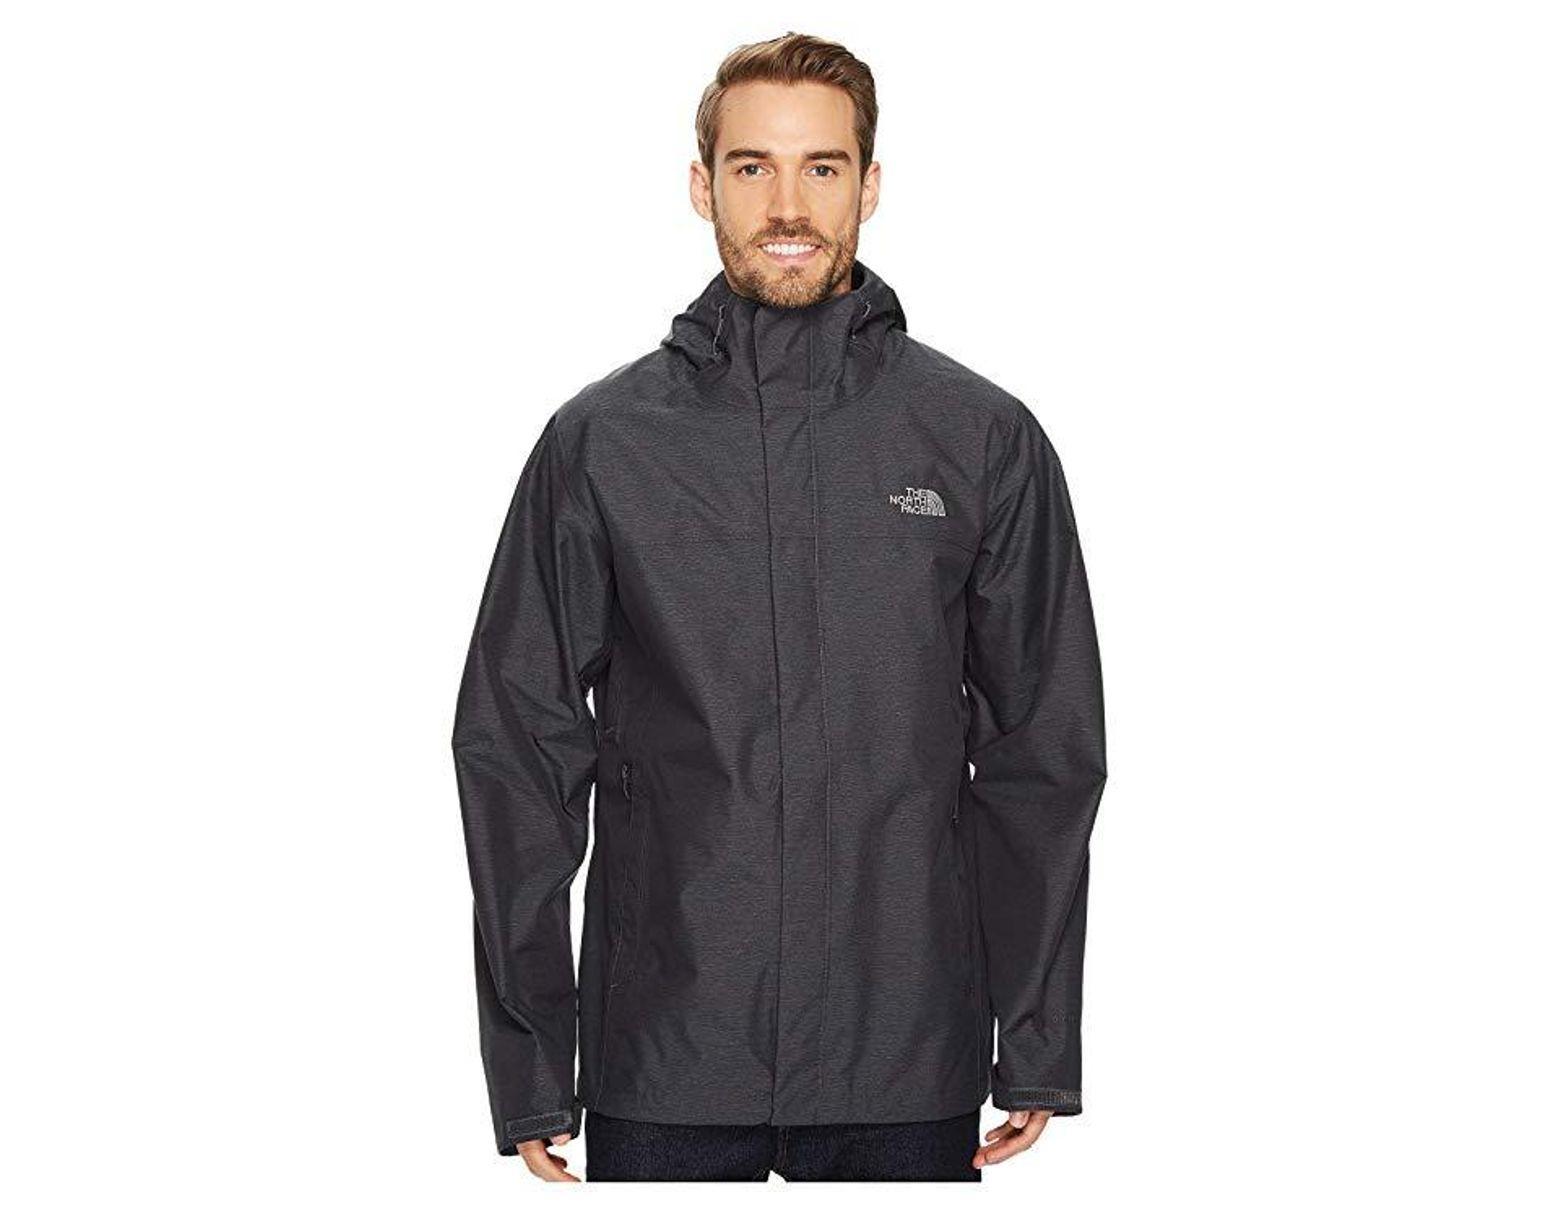 36ff0517d The North Face Venture 2 Jacket Tall (tnf Dark Grey Heather/tnf Dark ...